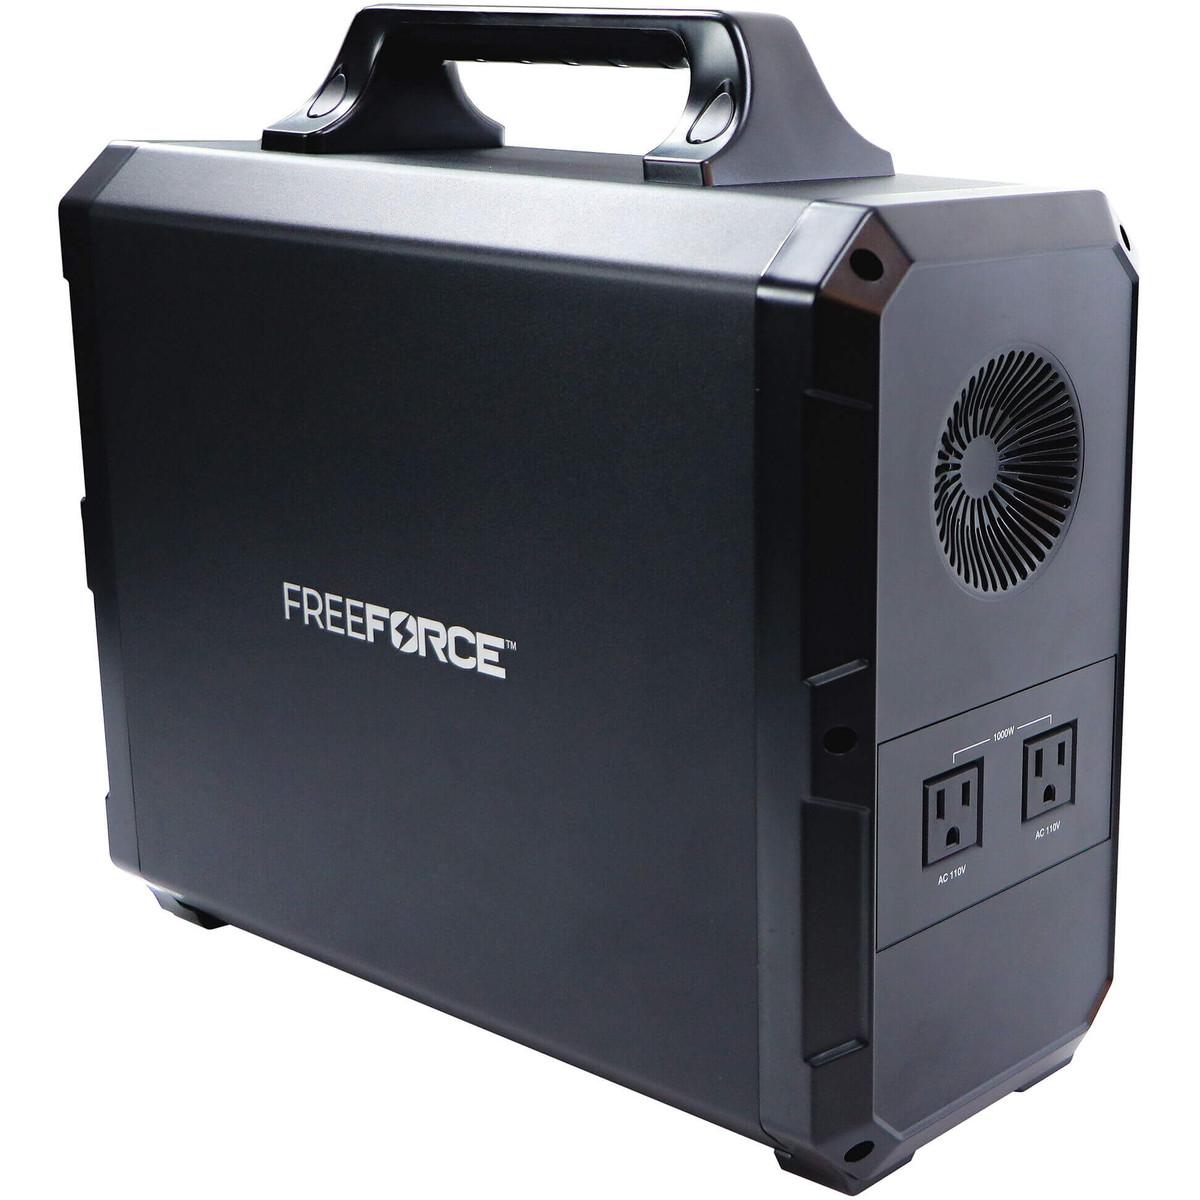 FreeForce Ultralite 1800 Portable Power Station side image